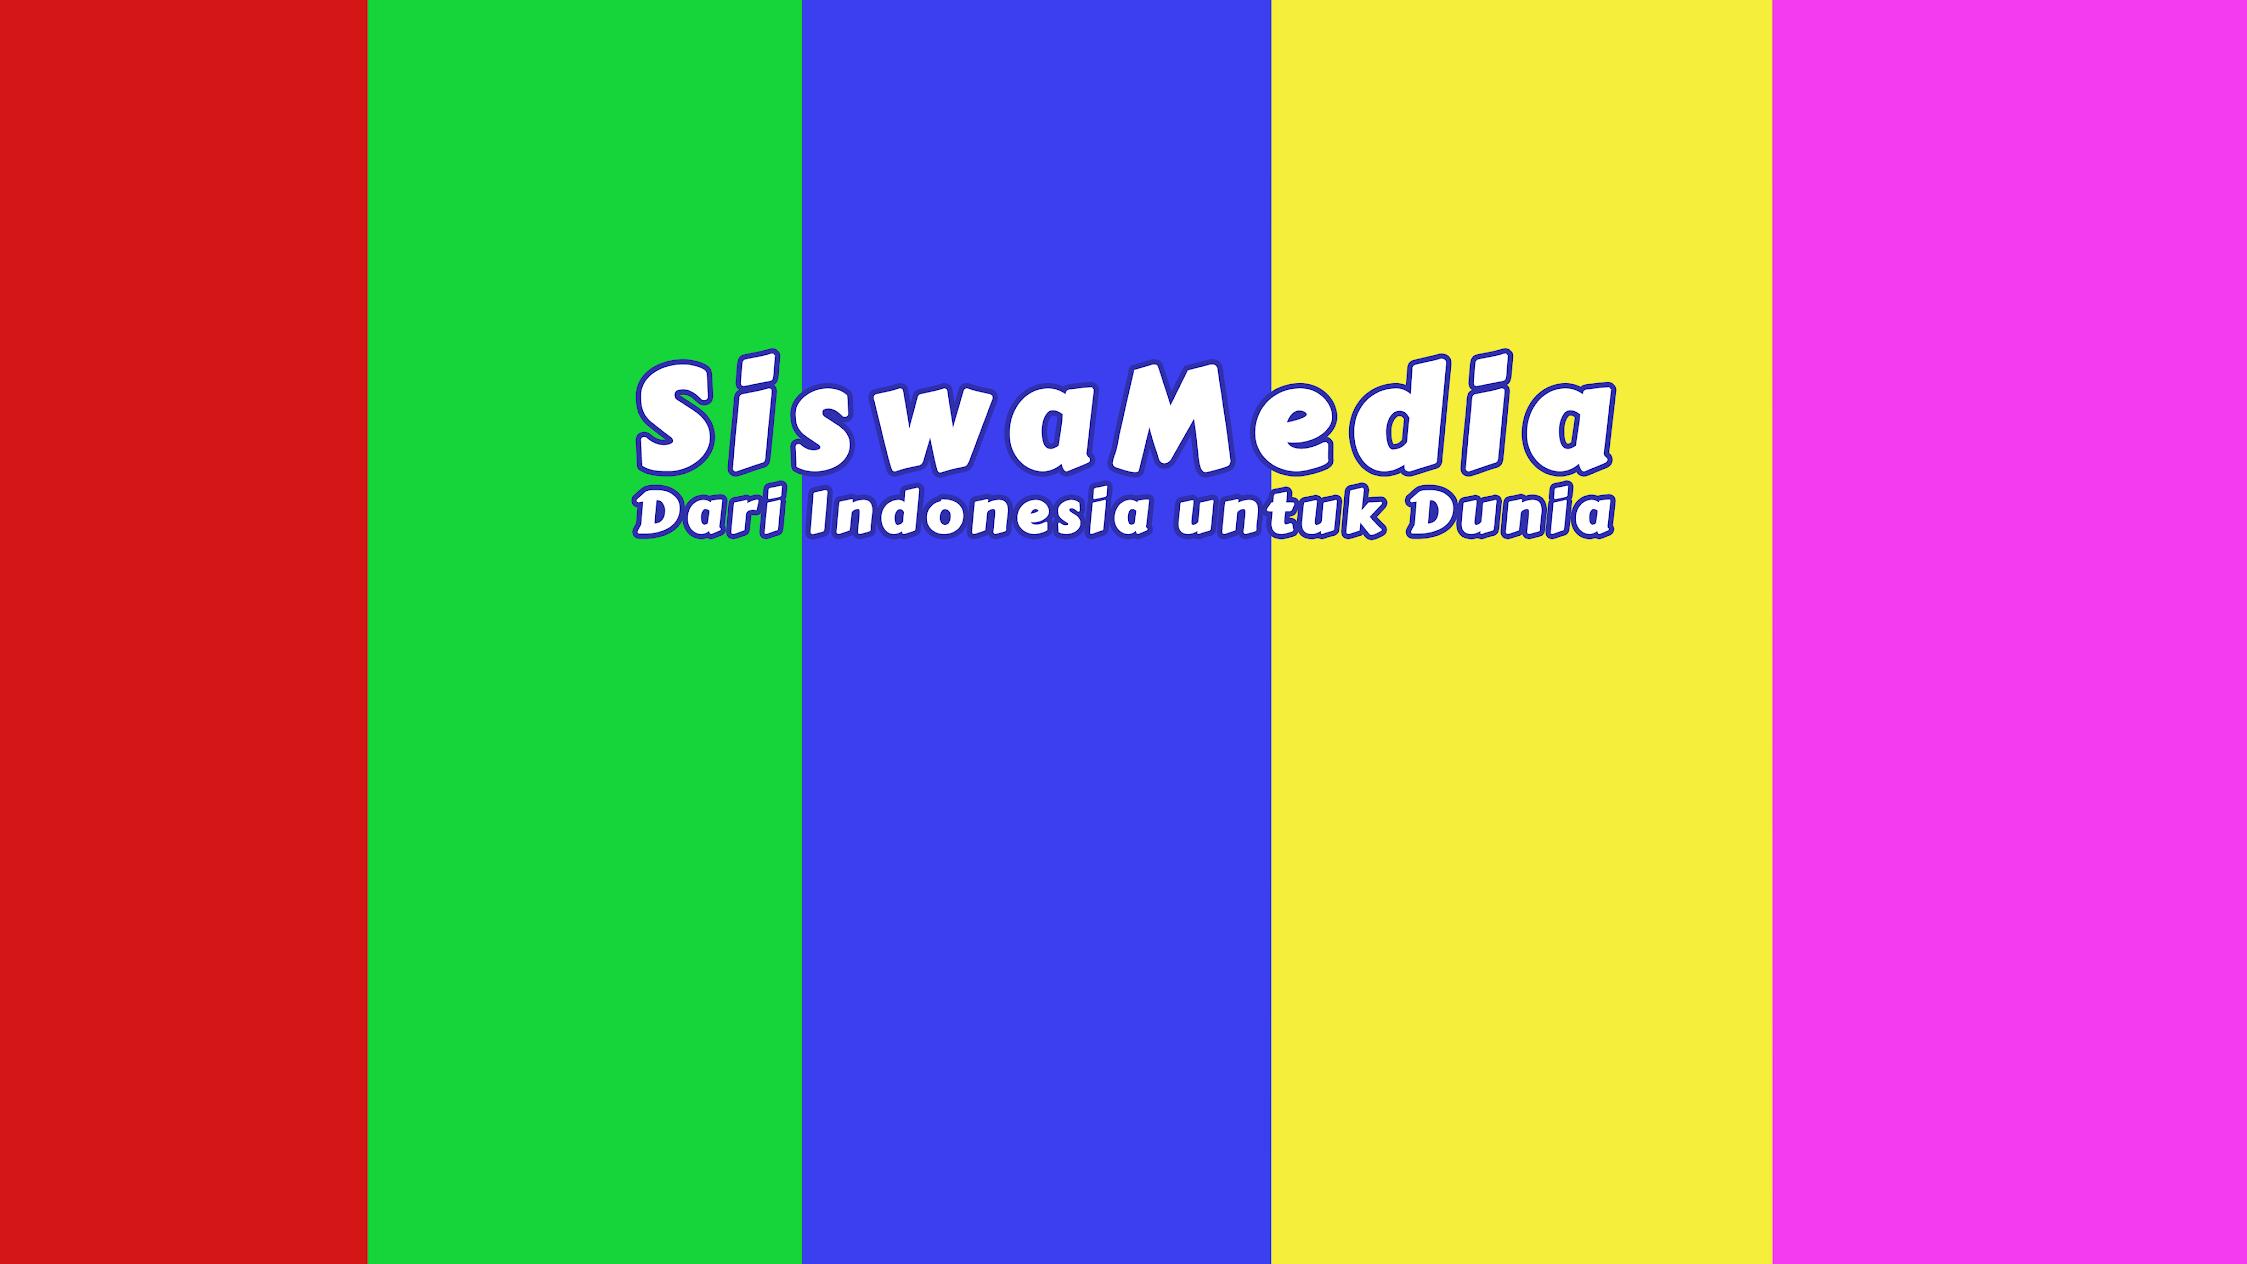 SiswaMedia